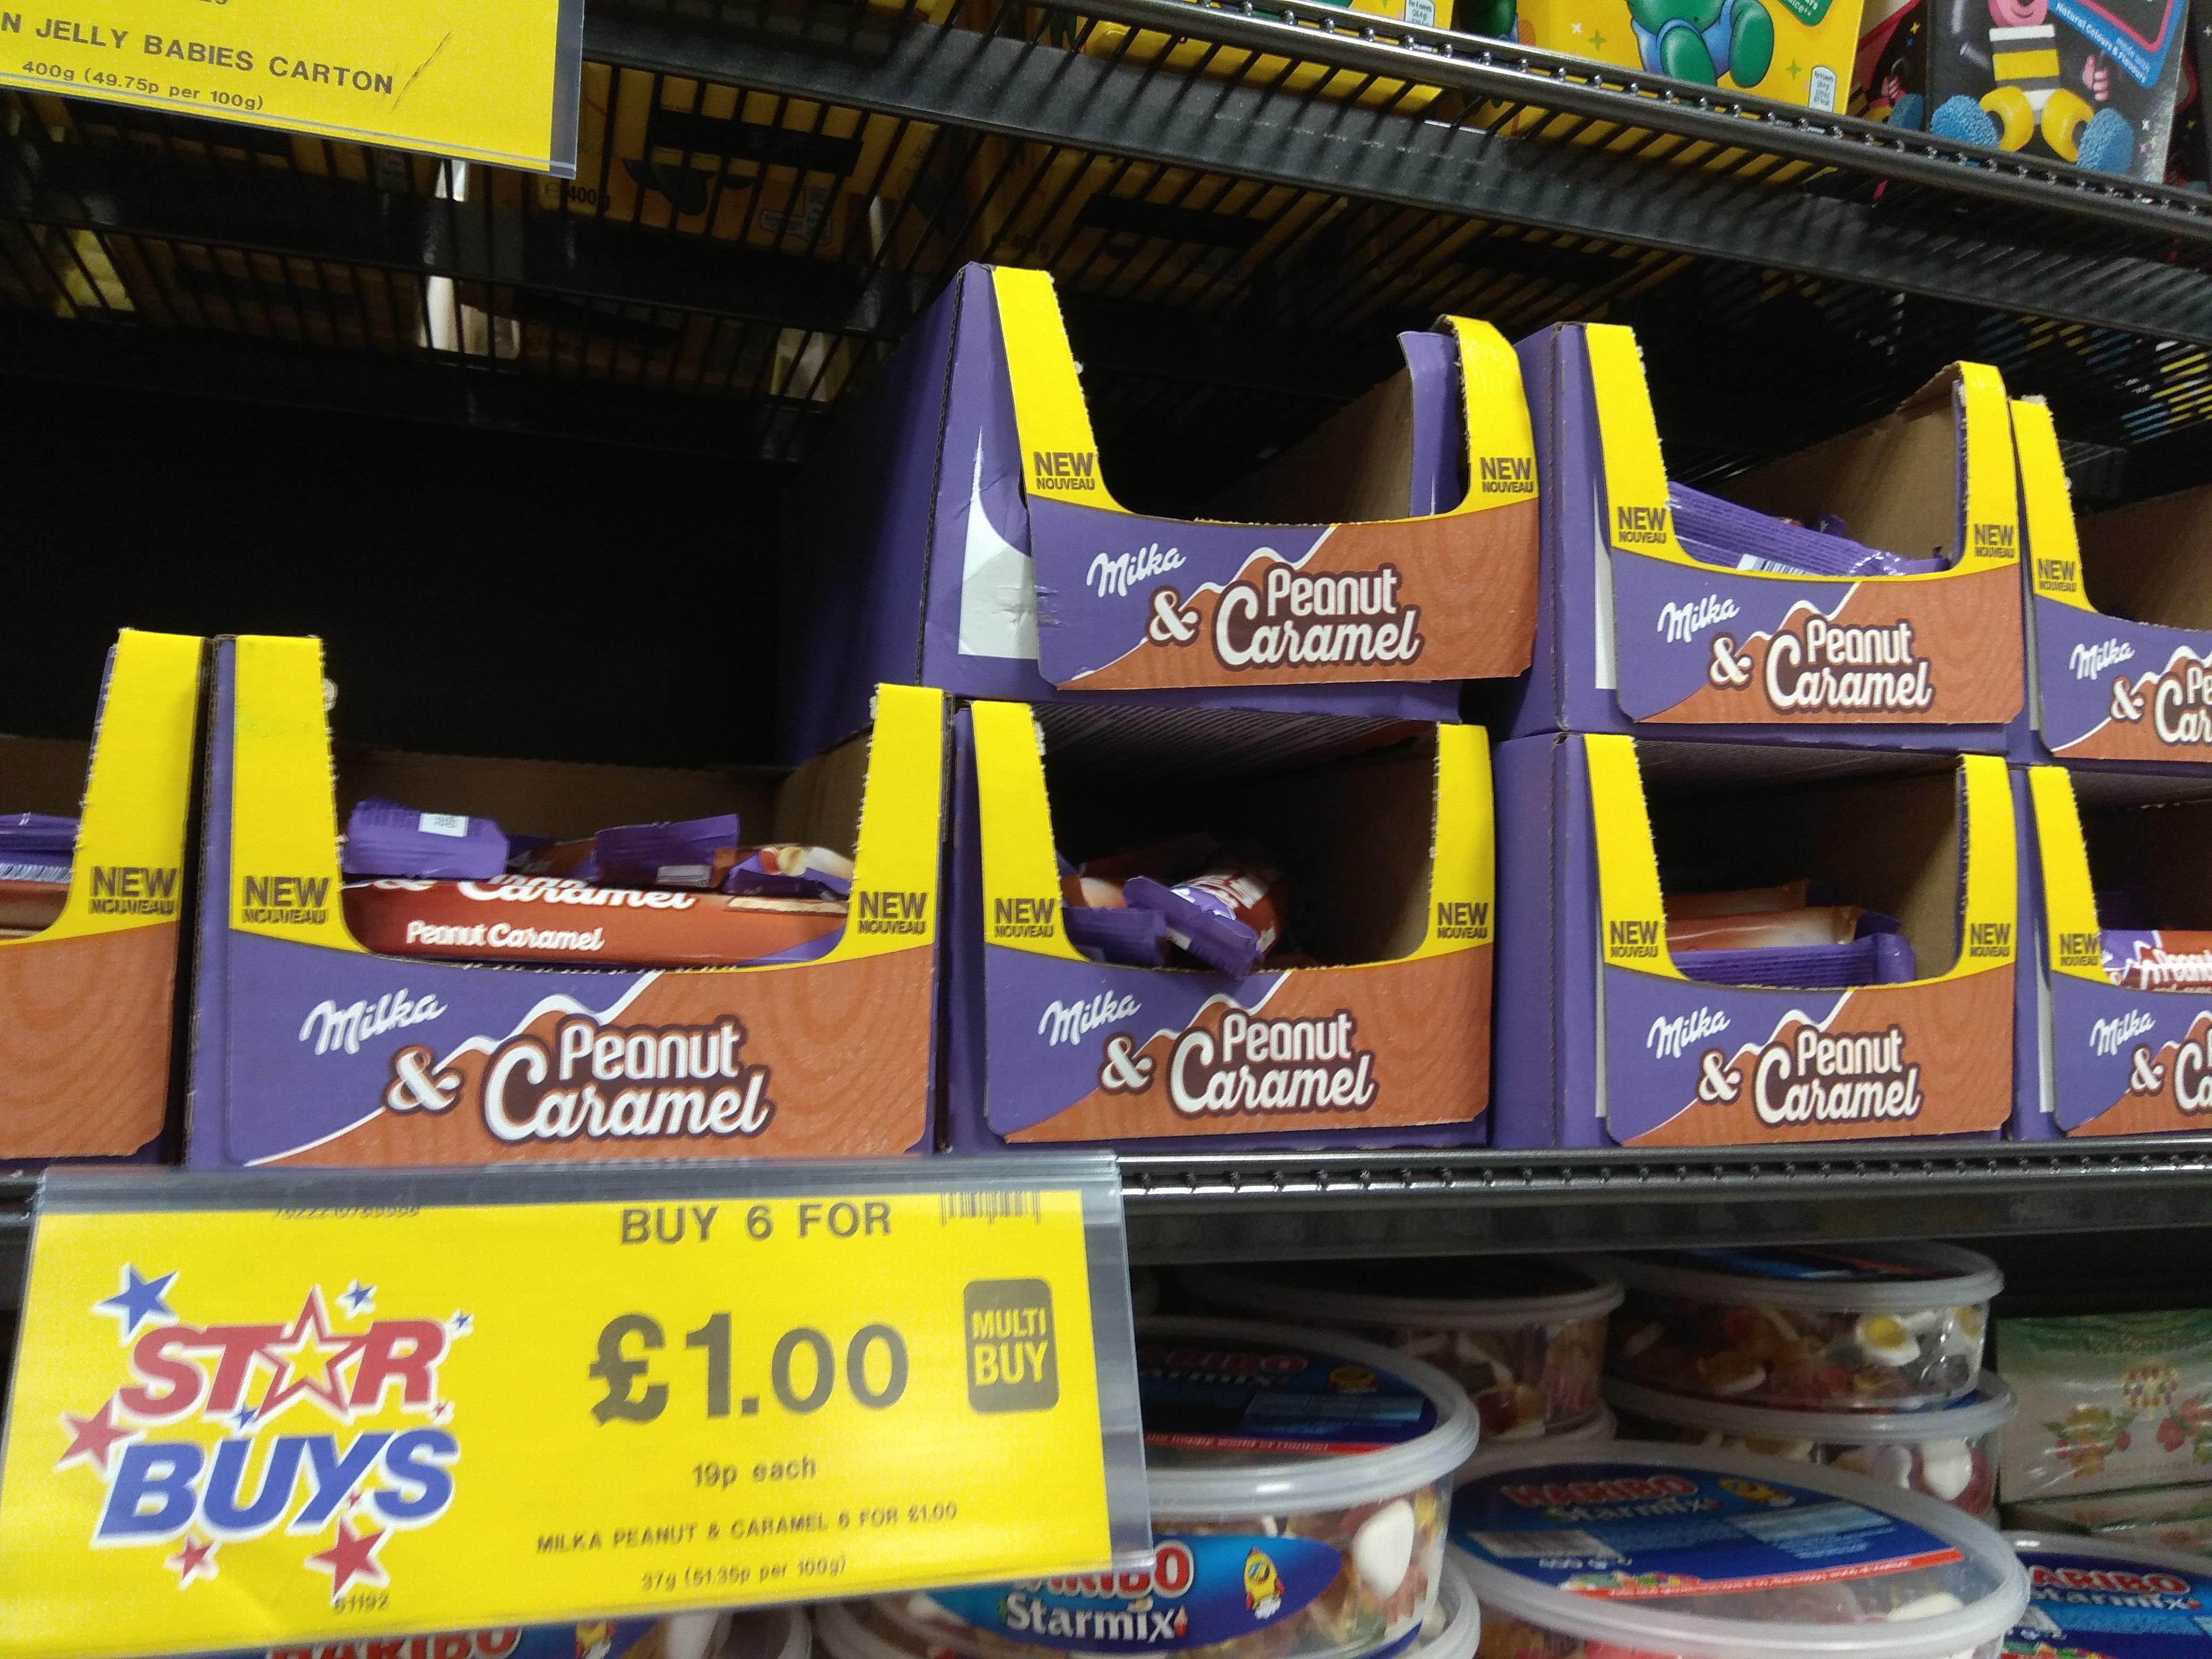 Home Bargains Milka & Peanut Caramel 37g bars 6 for £1